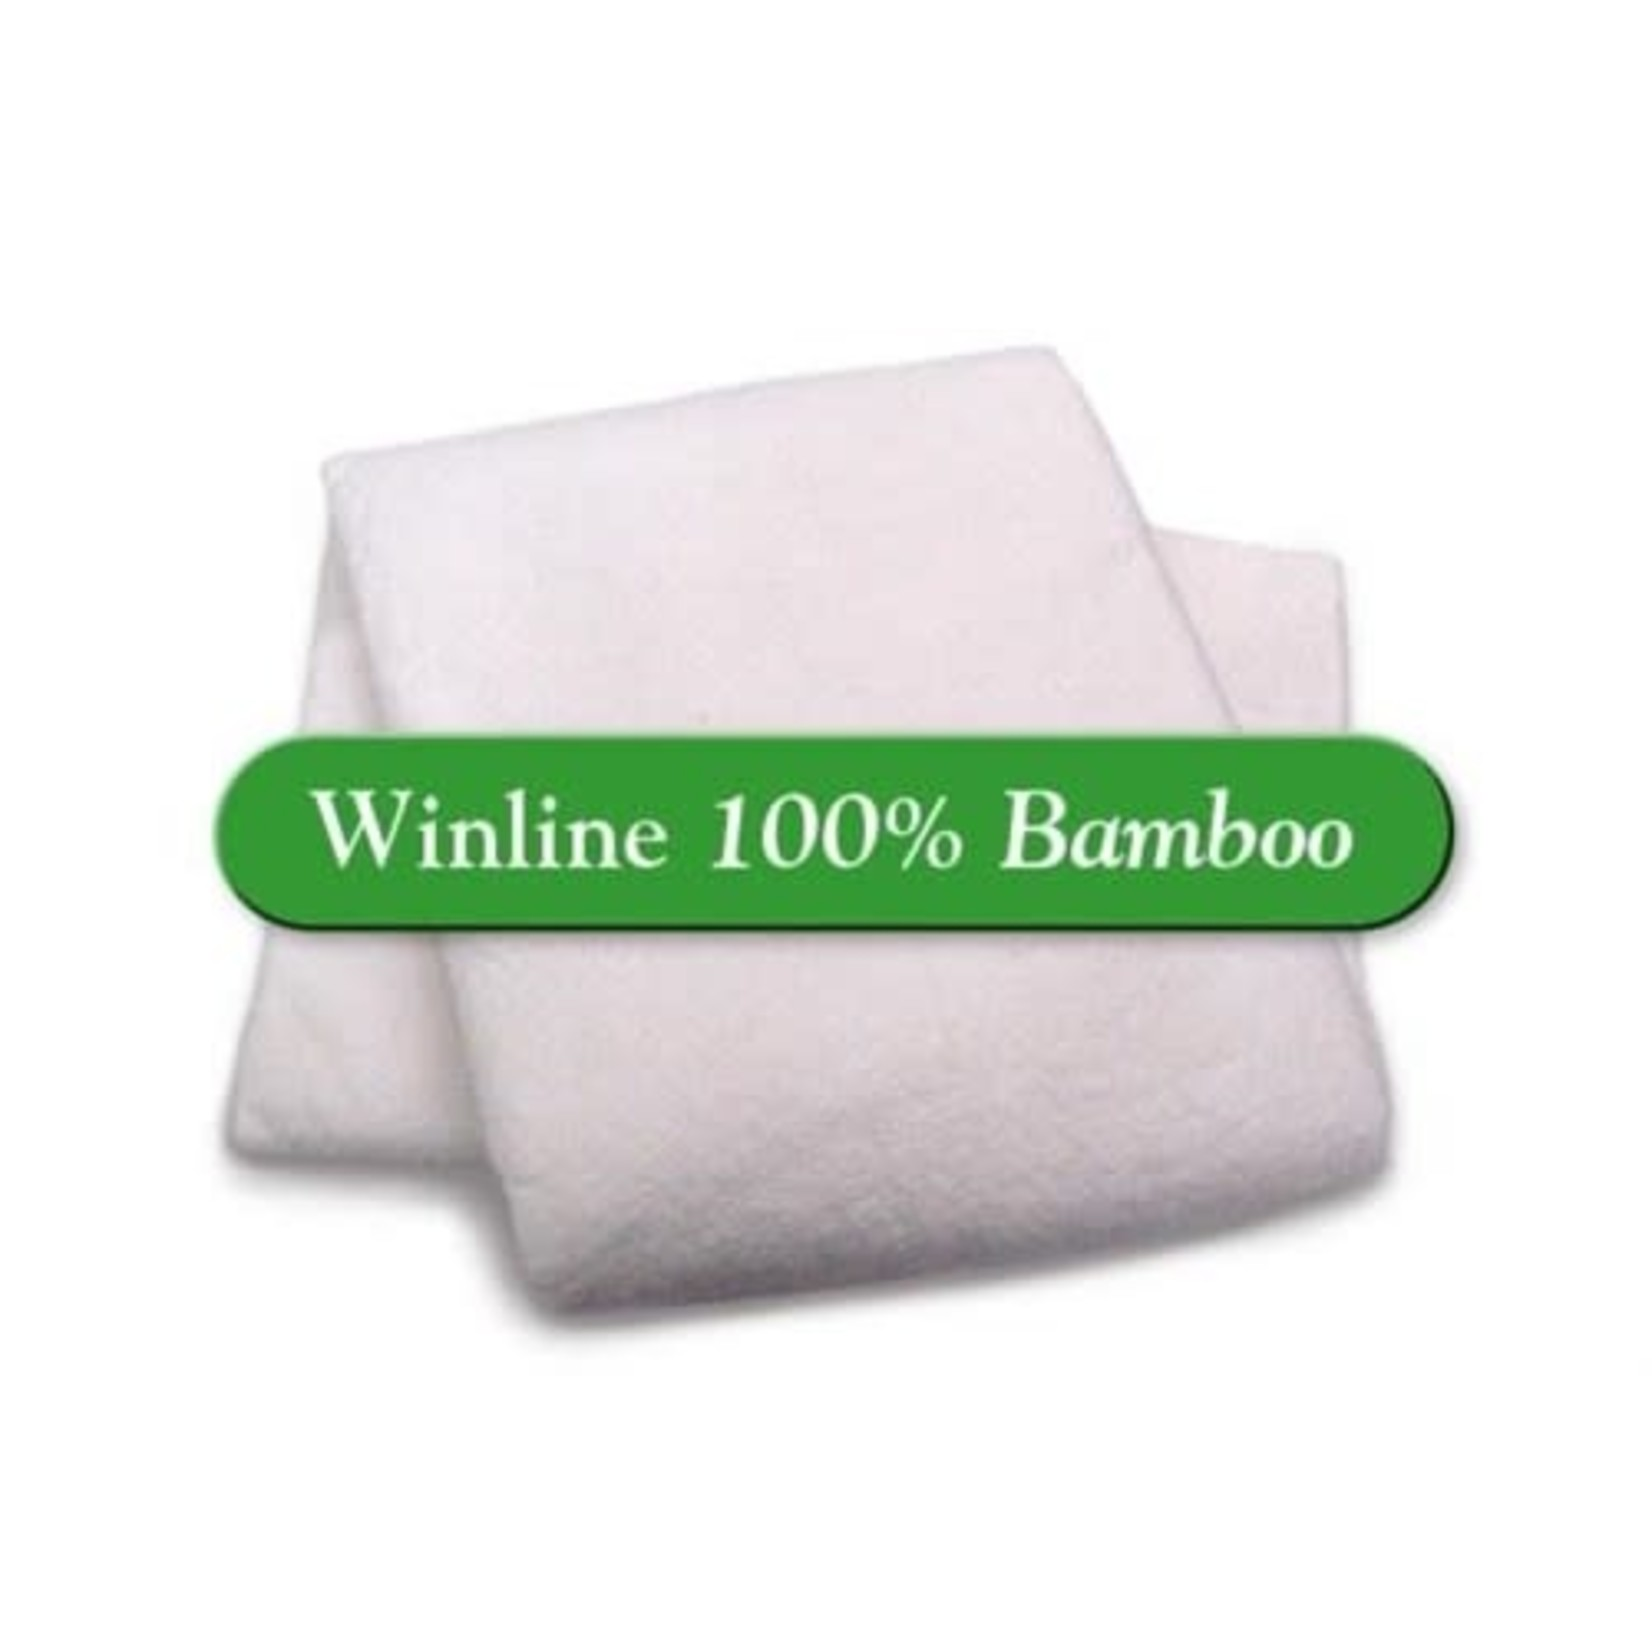 Winline Bamboo - crib 115cm x 115cm